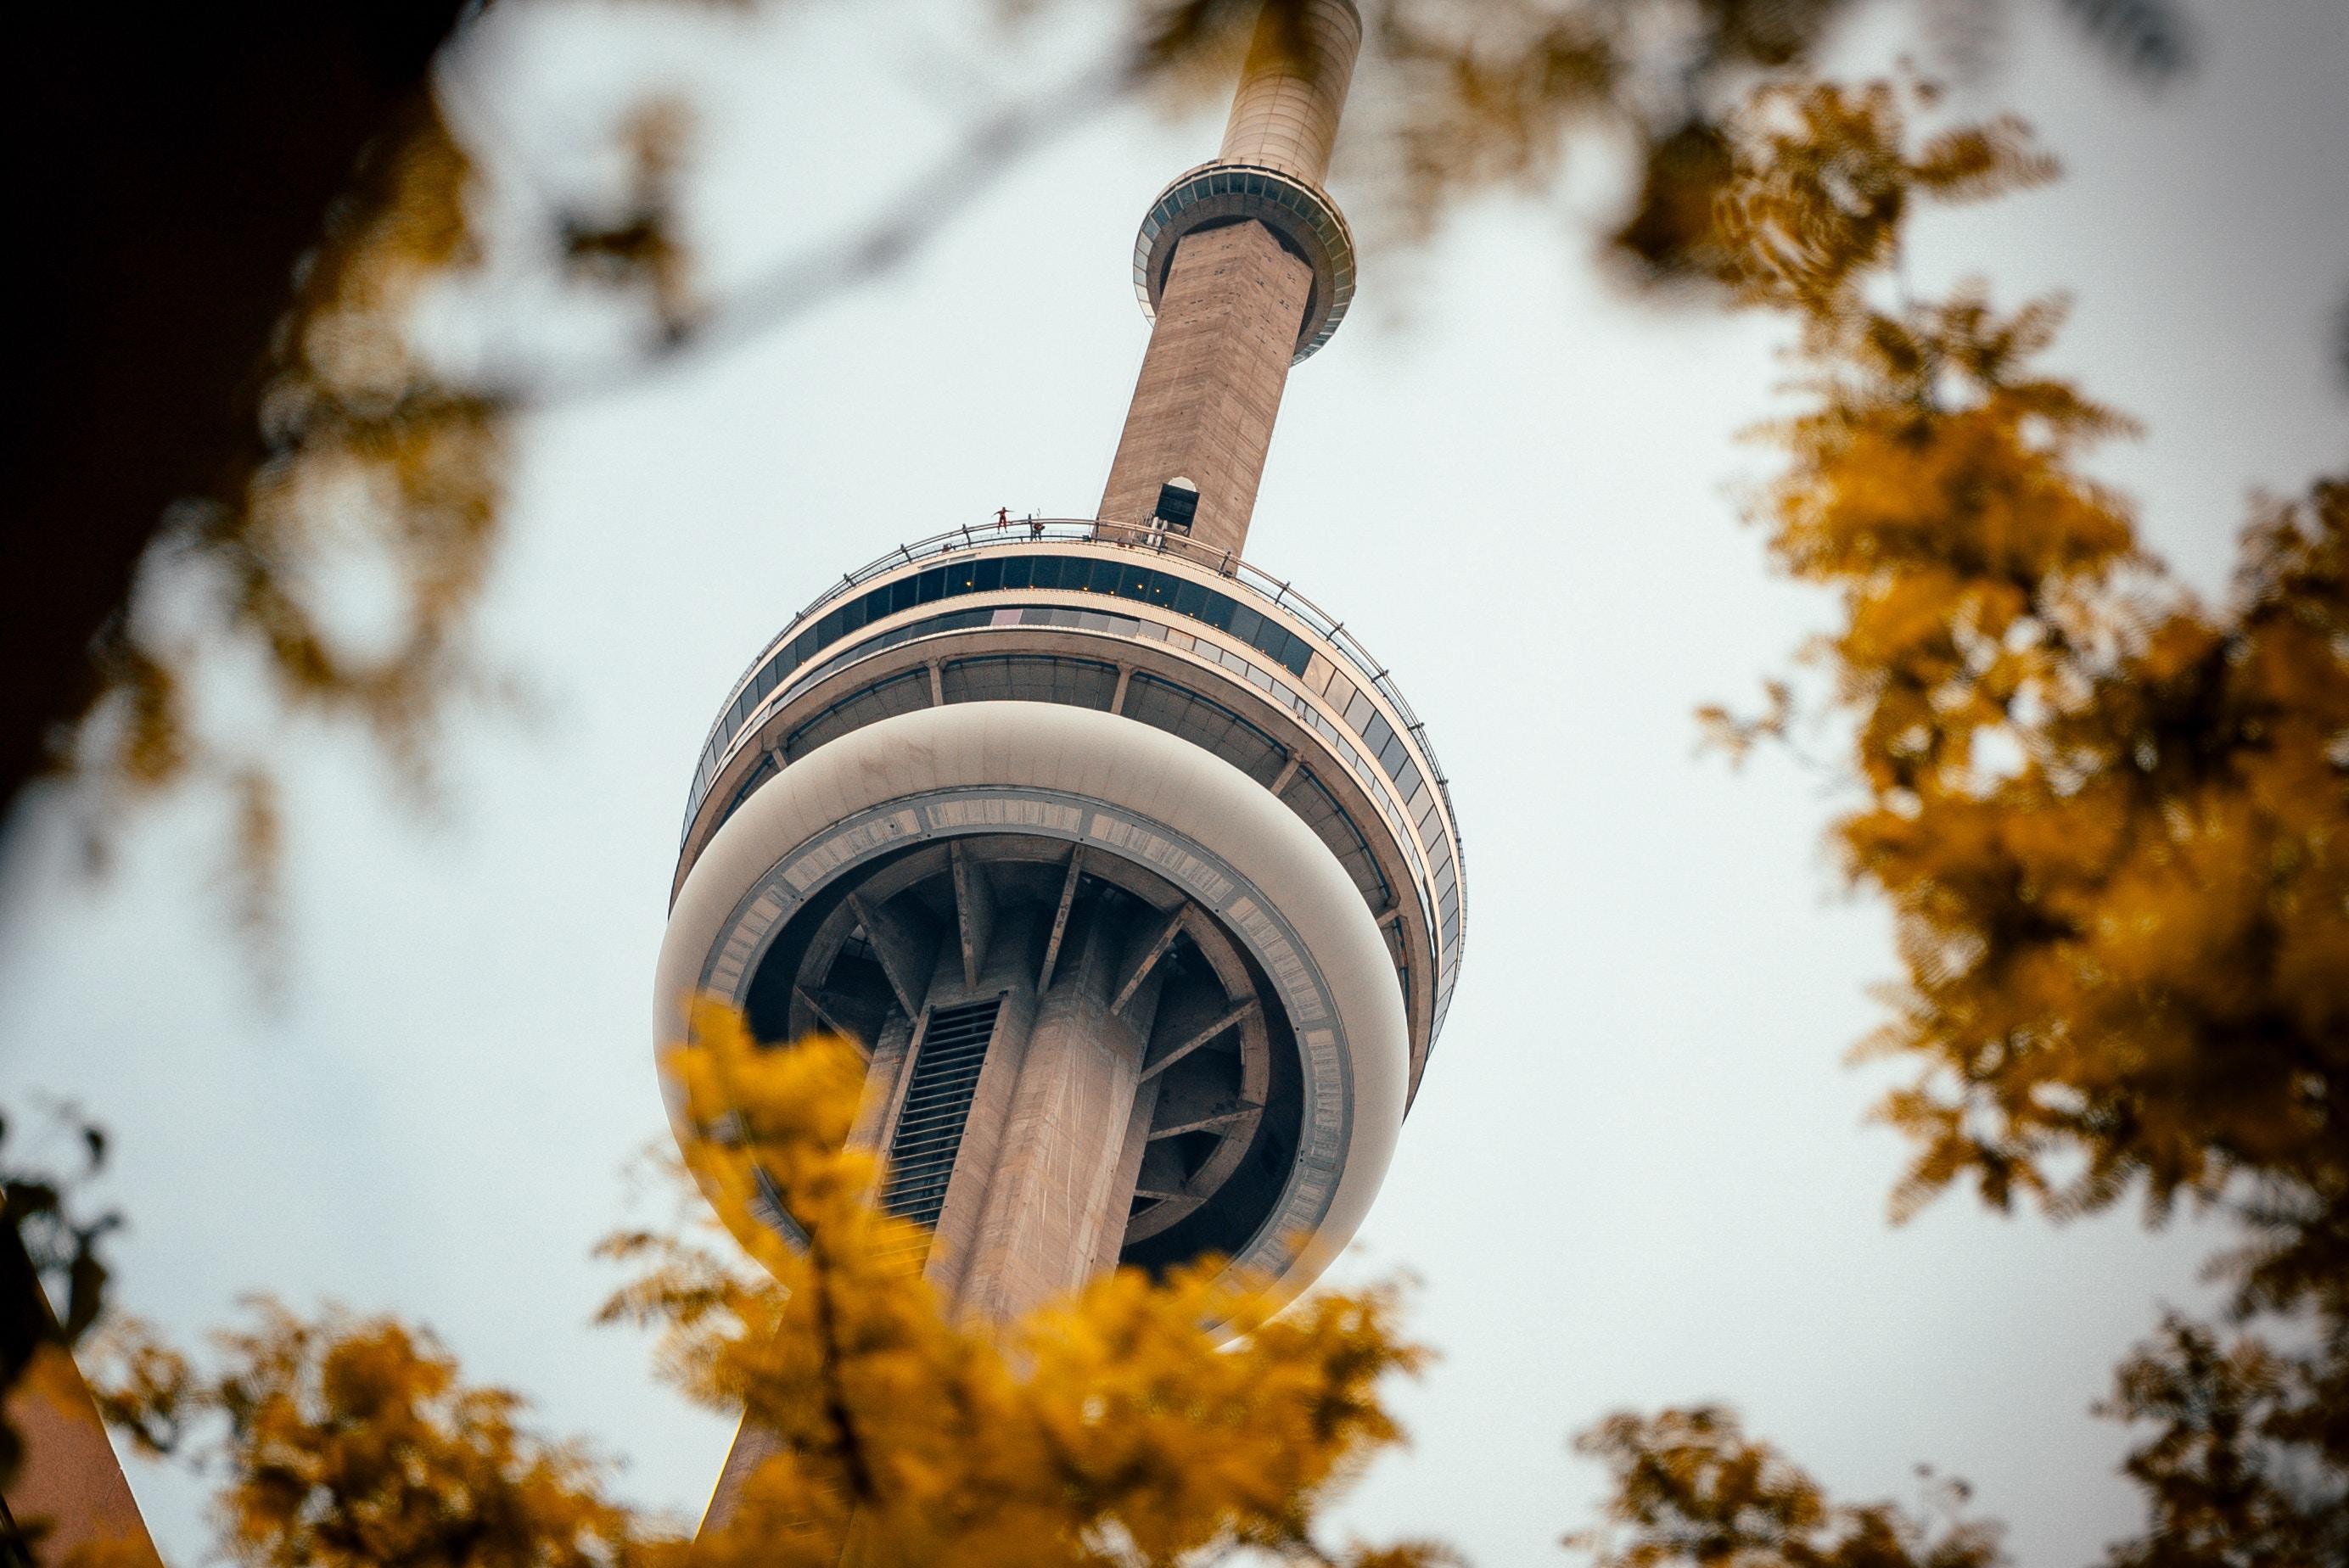 Crowe Soberman Best Accounting Firm Toronto Canada